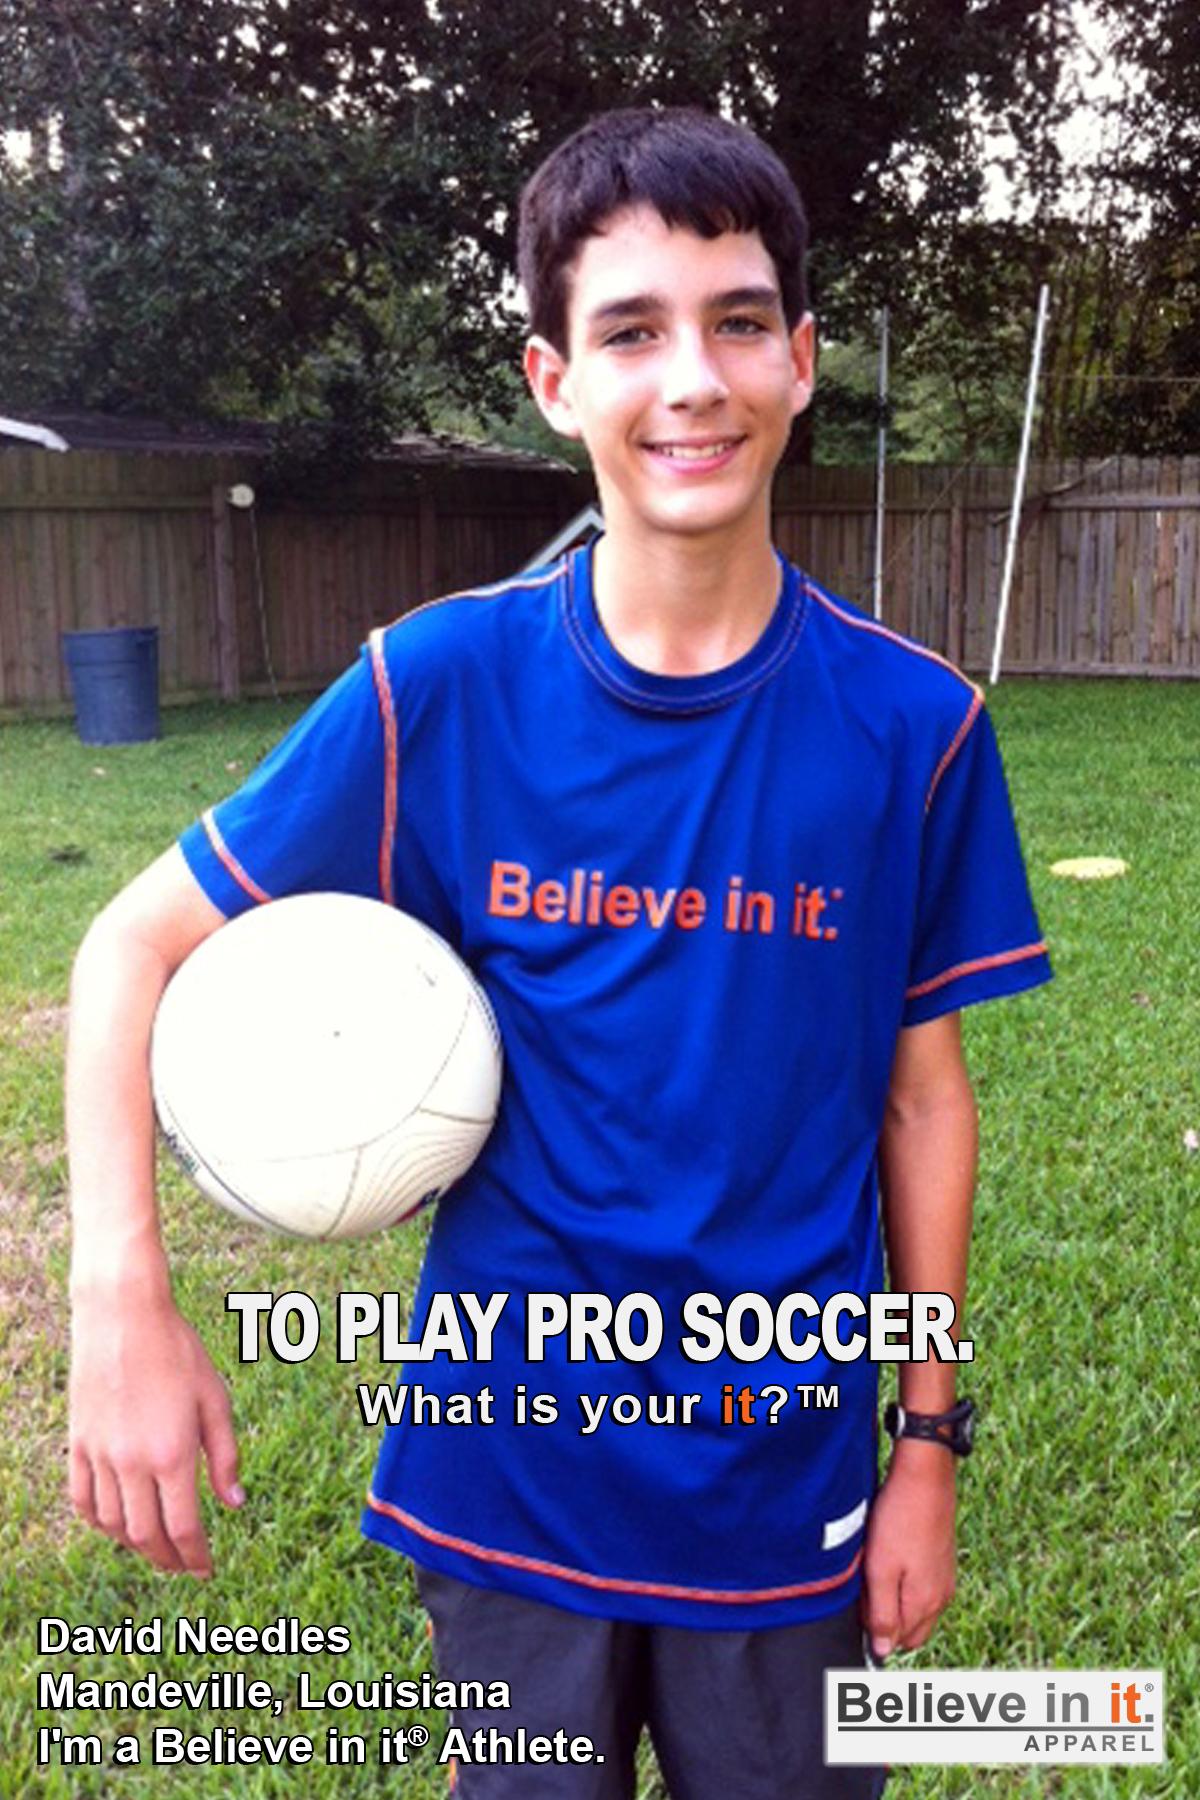 David Needles Believe in it Athlete